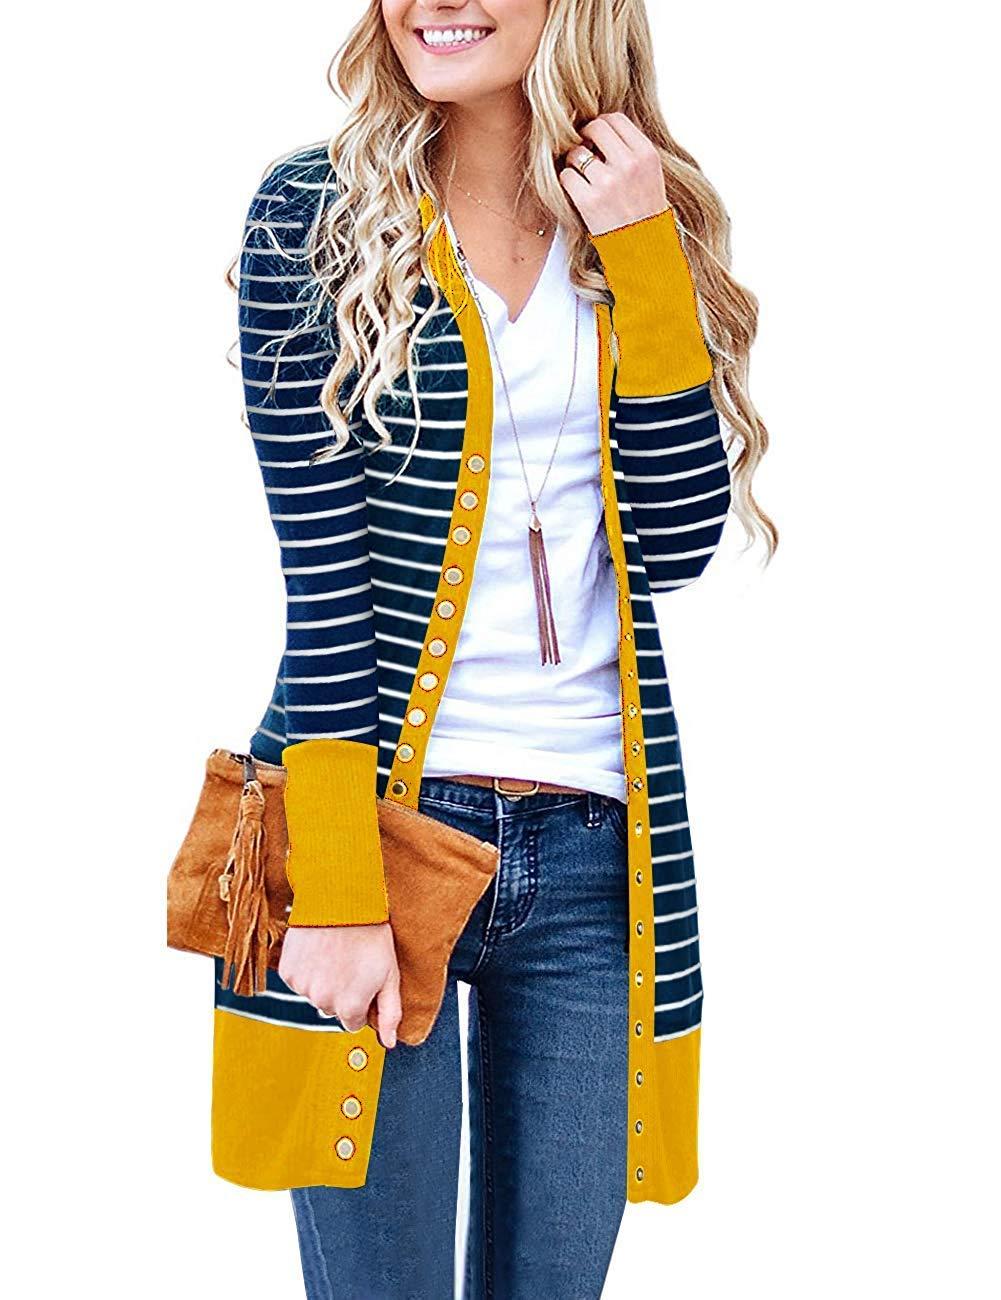 Basic Faith Women's S-3XL V-Neck Button Down Knitwear Long Sleeve Soft Knit Casual Cardigan Sweater Stripe Mustard M